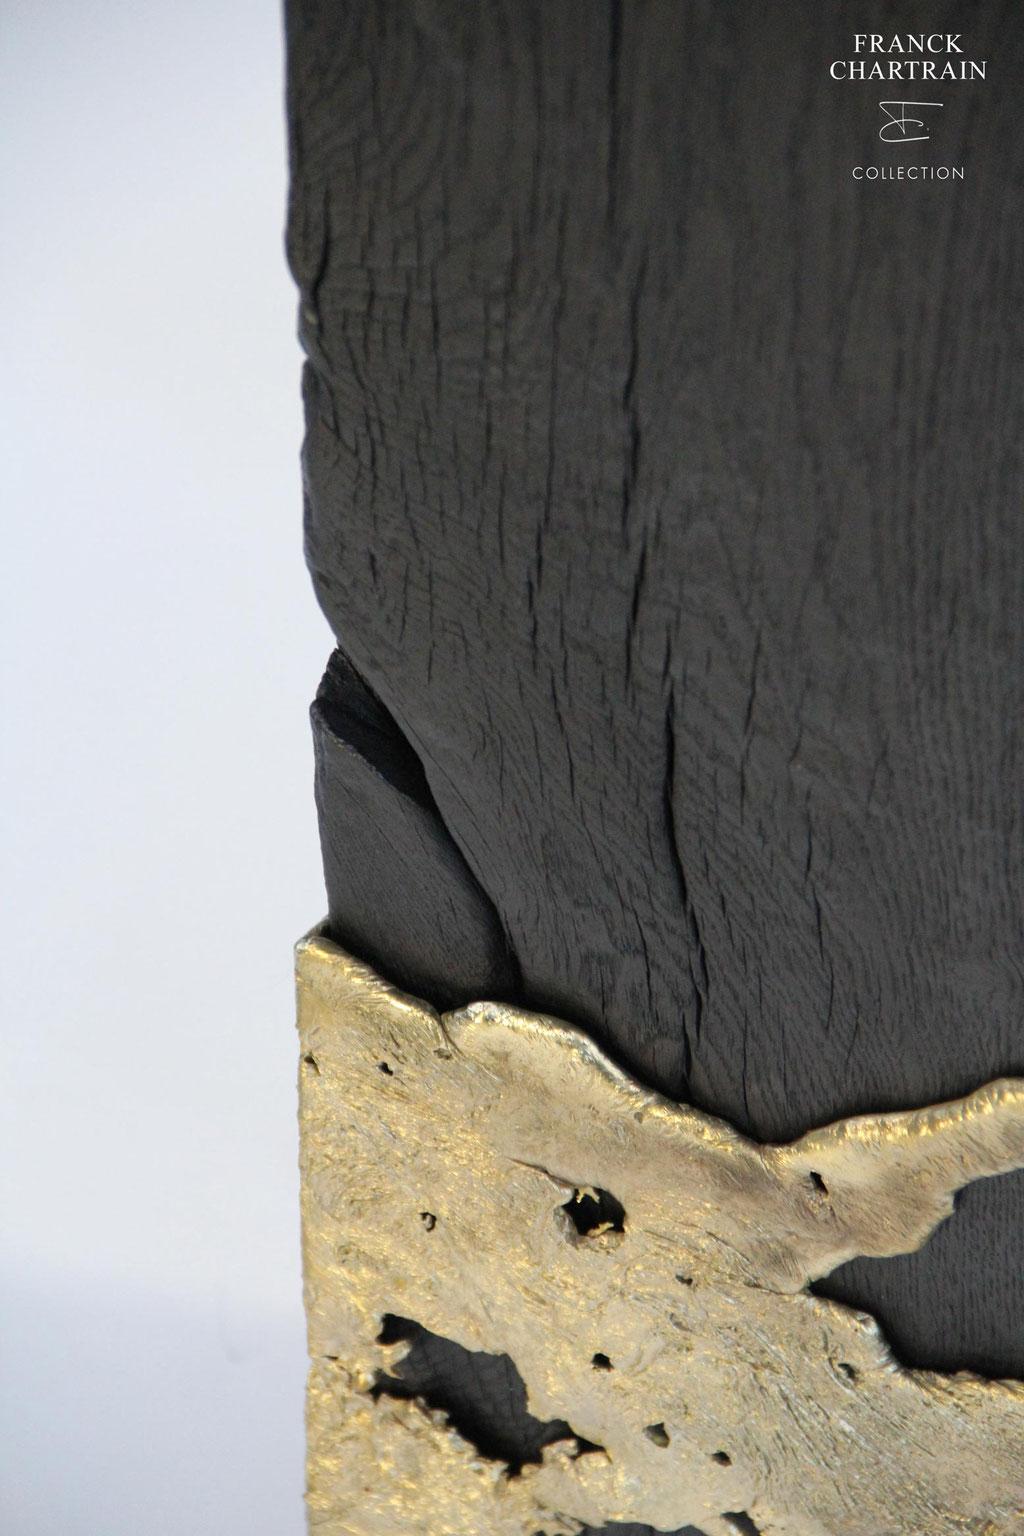 PHOENIX PIEDESTAL, Bronze,bois brûlé